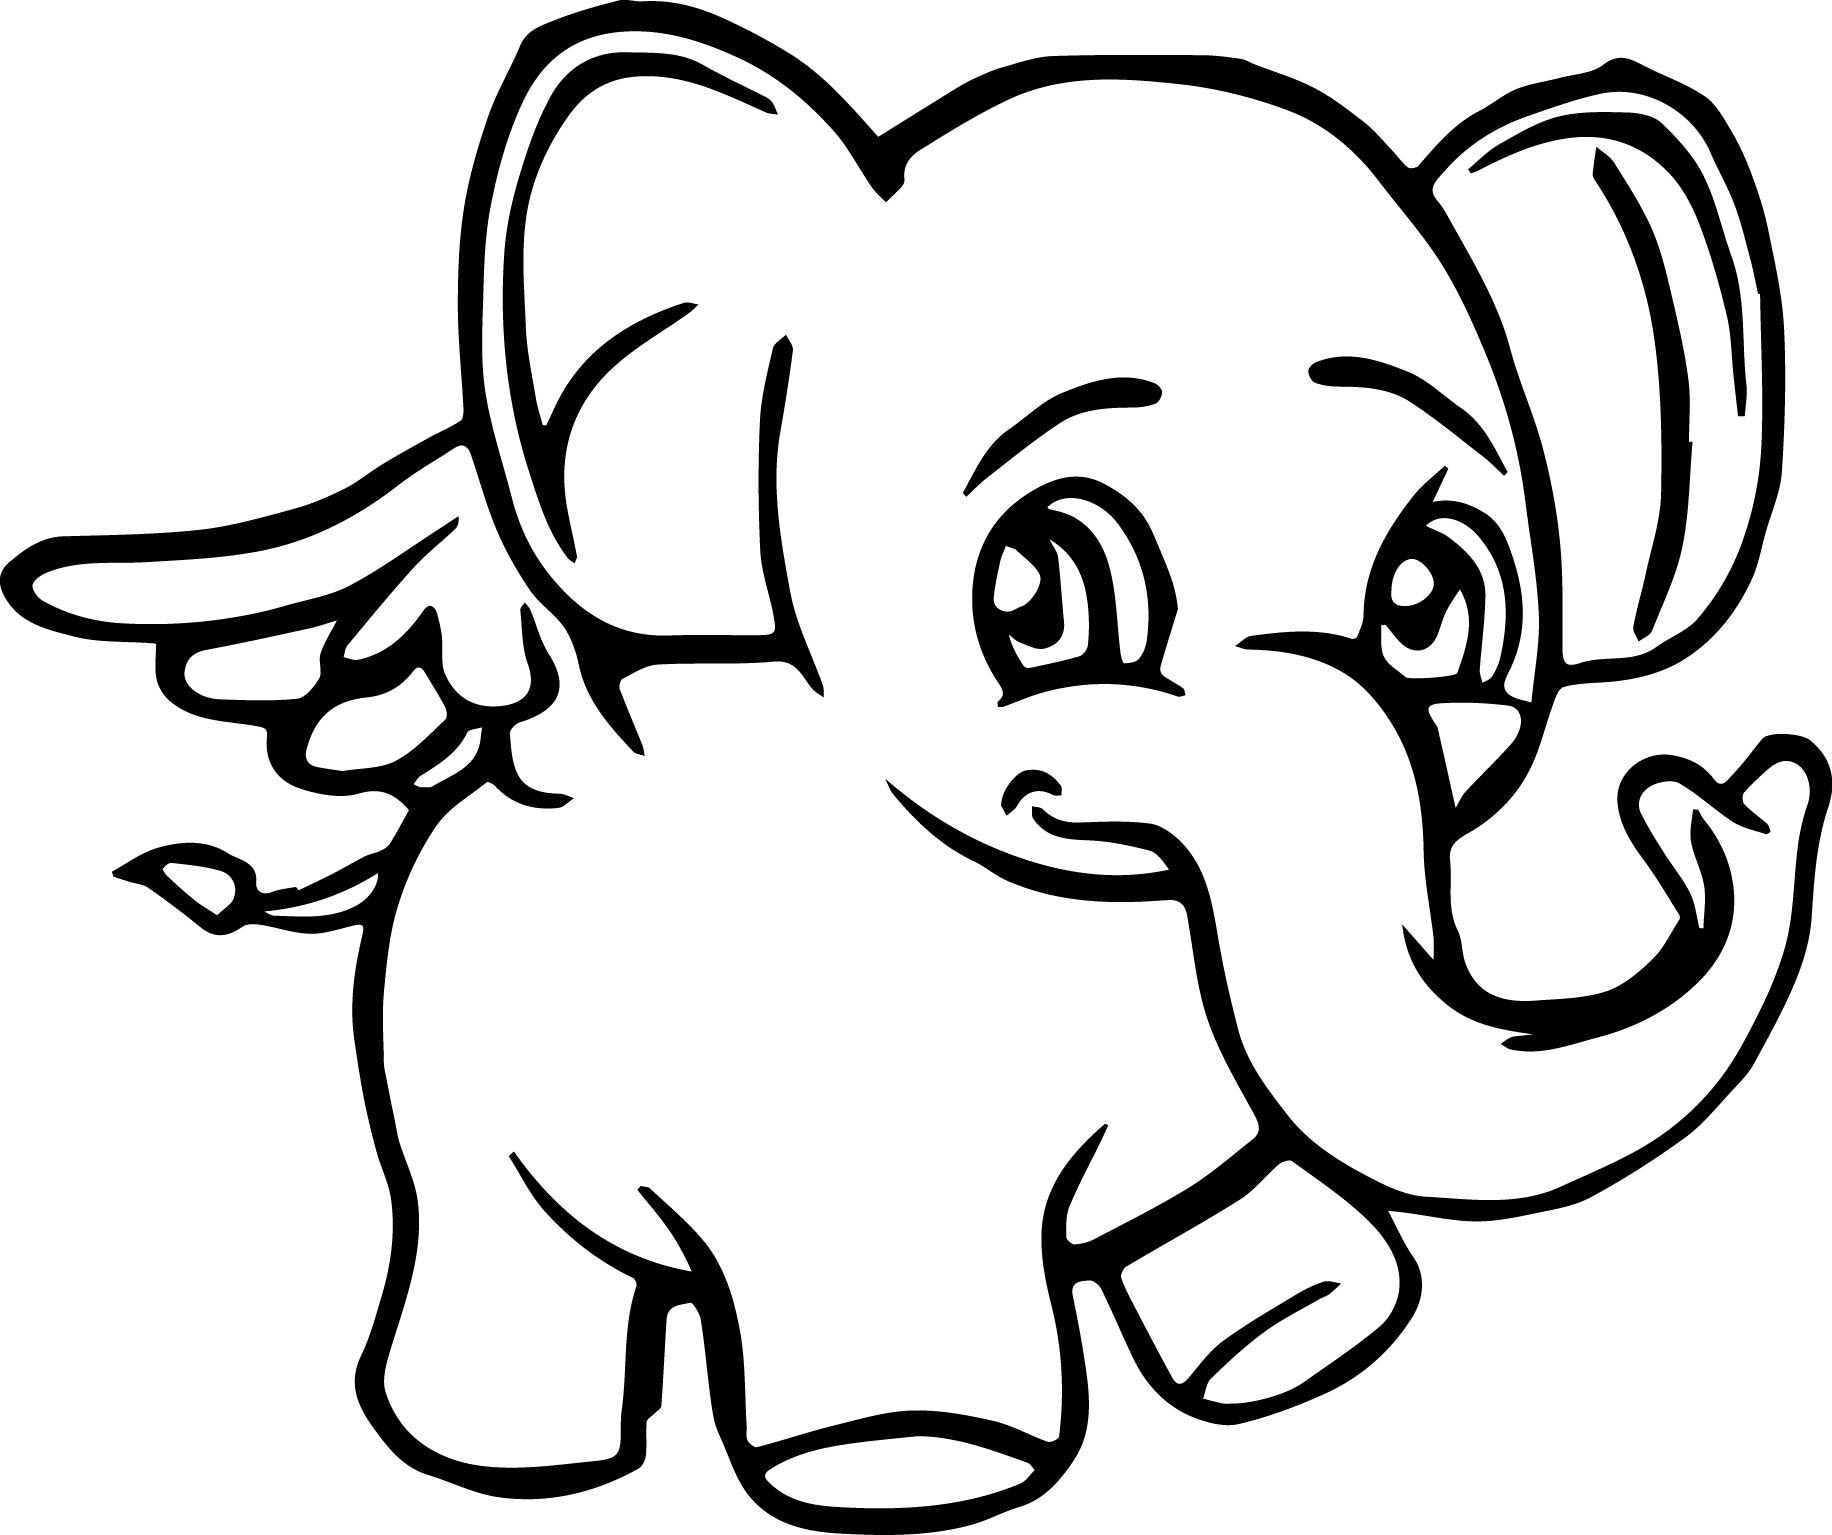 Angel Elephant Cartoon Coloring Page